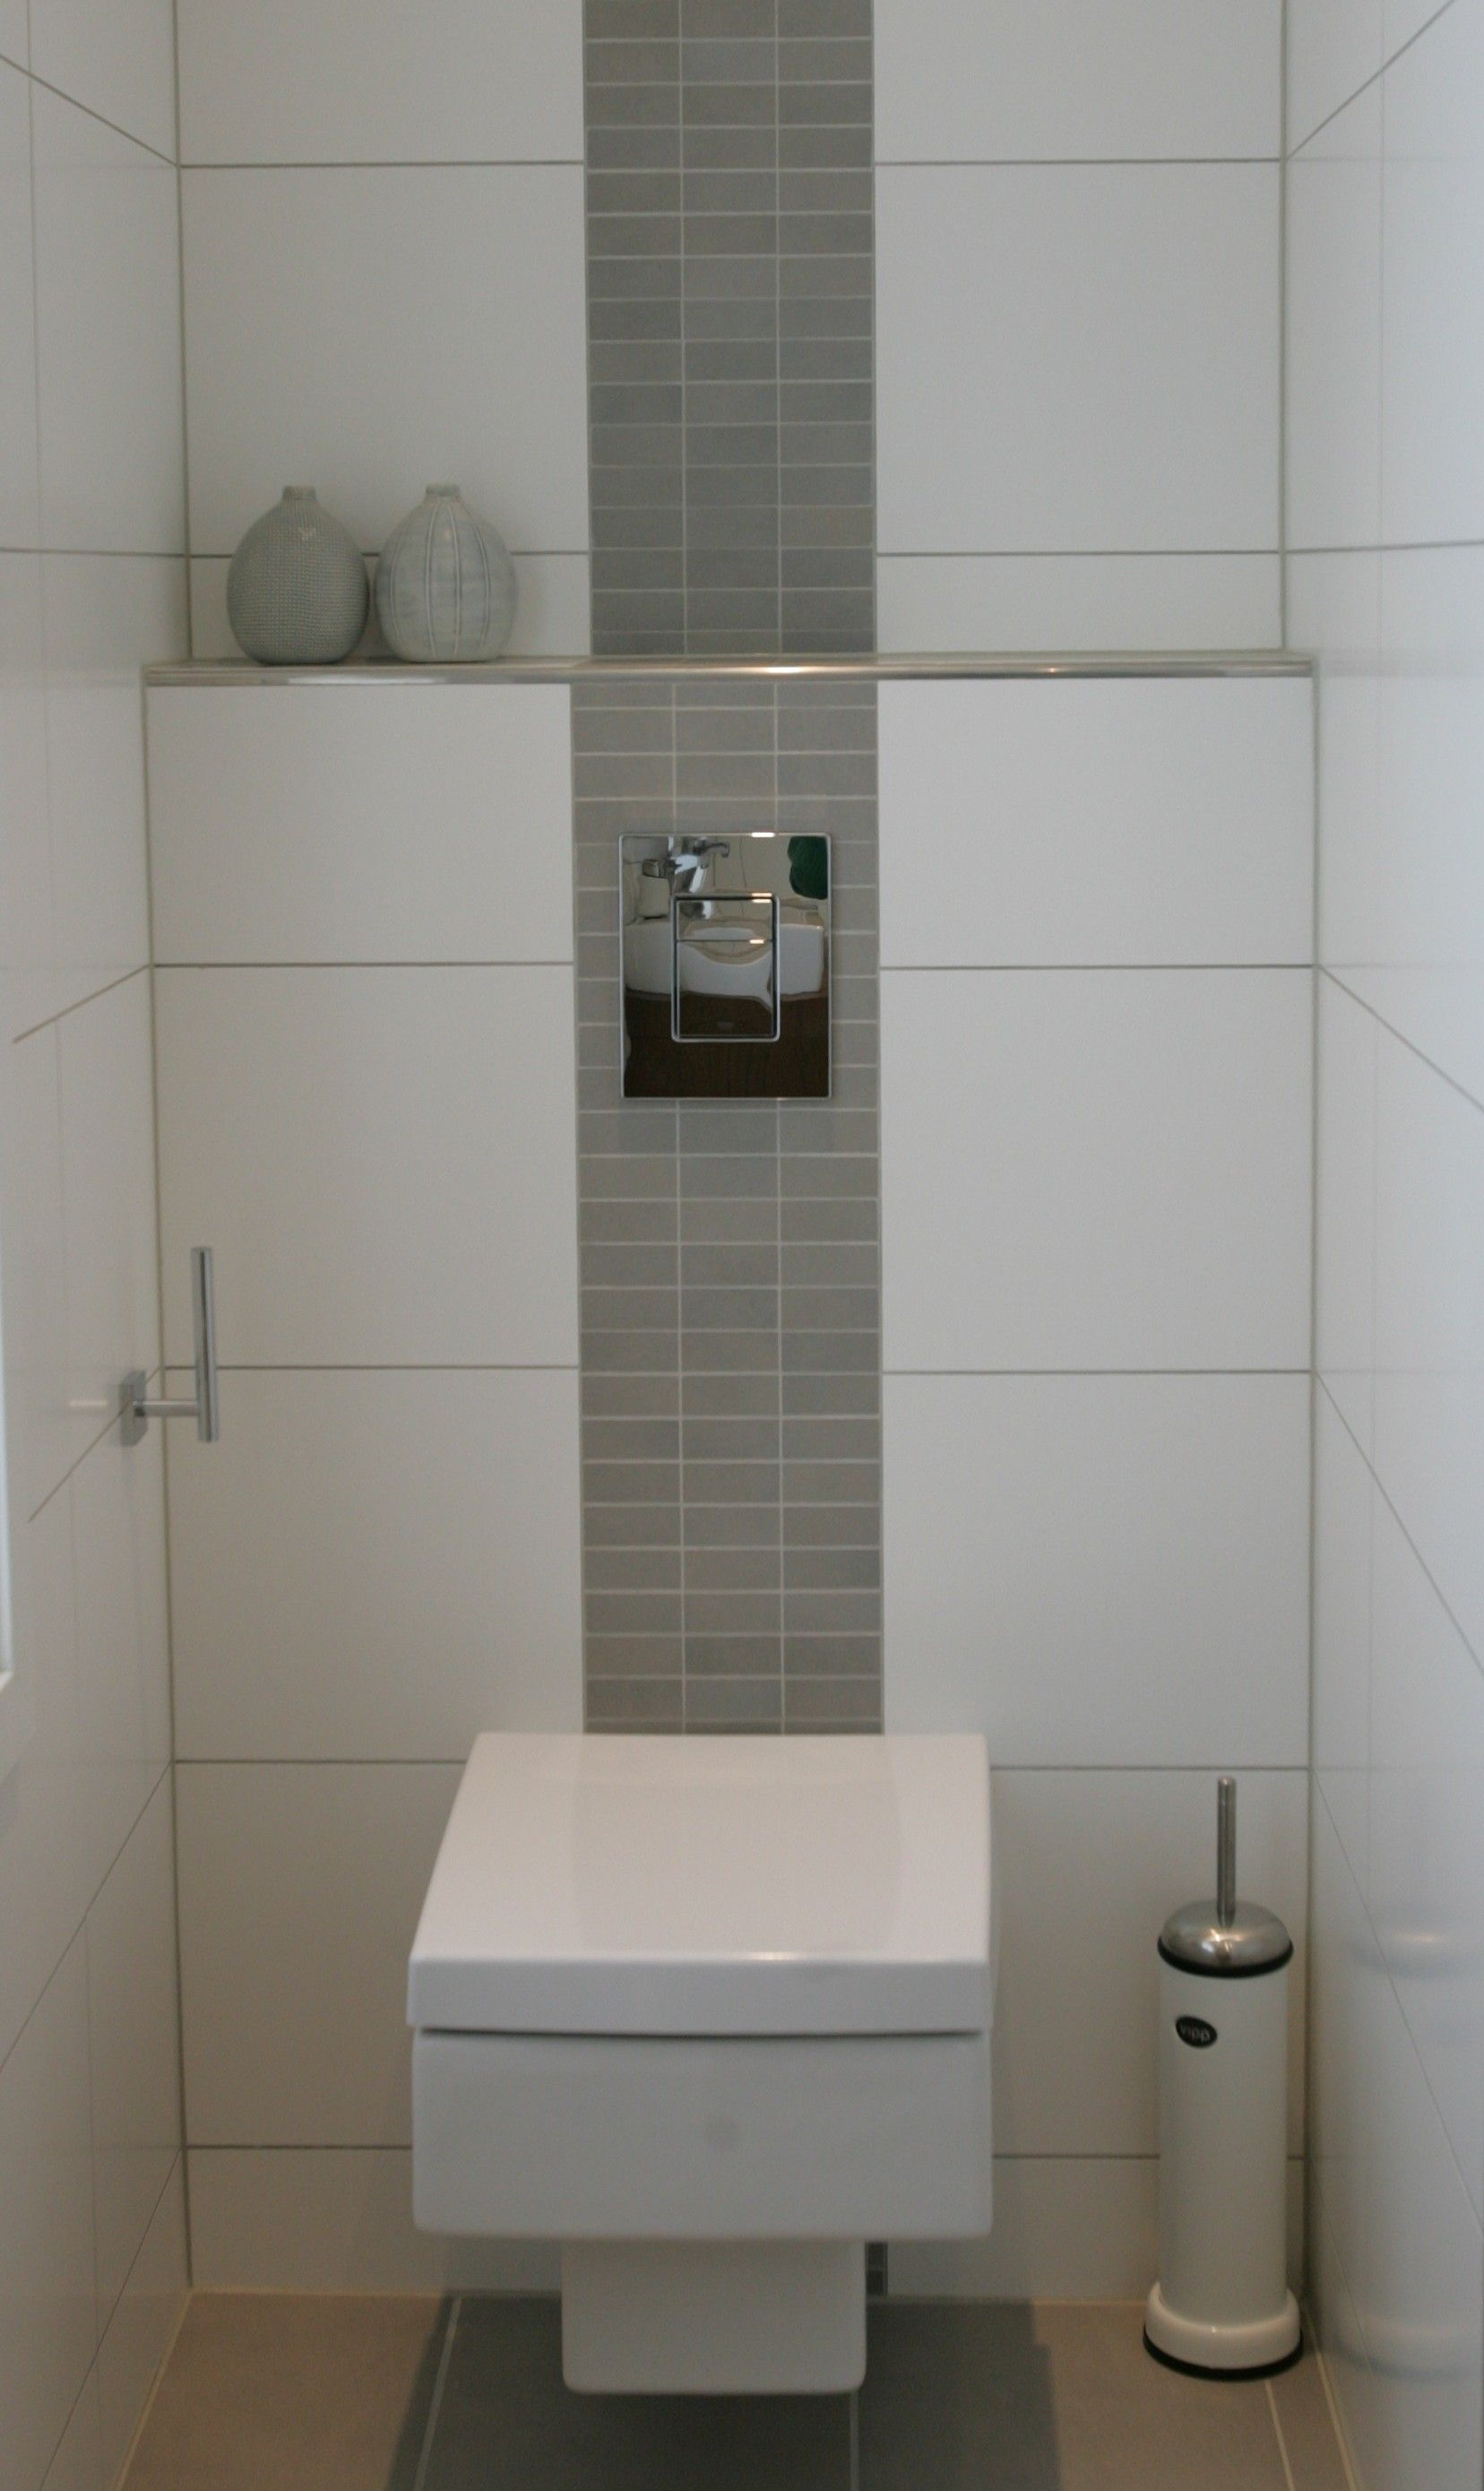 g ste wc badezimmer badezimmer g ste wc und bad. Black Bedroom Furniture Sets. Home Design Ideas